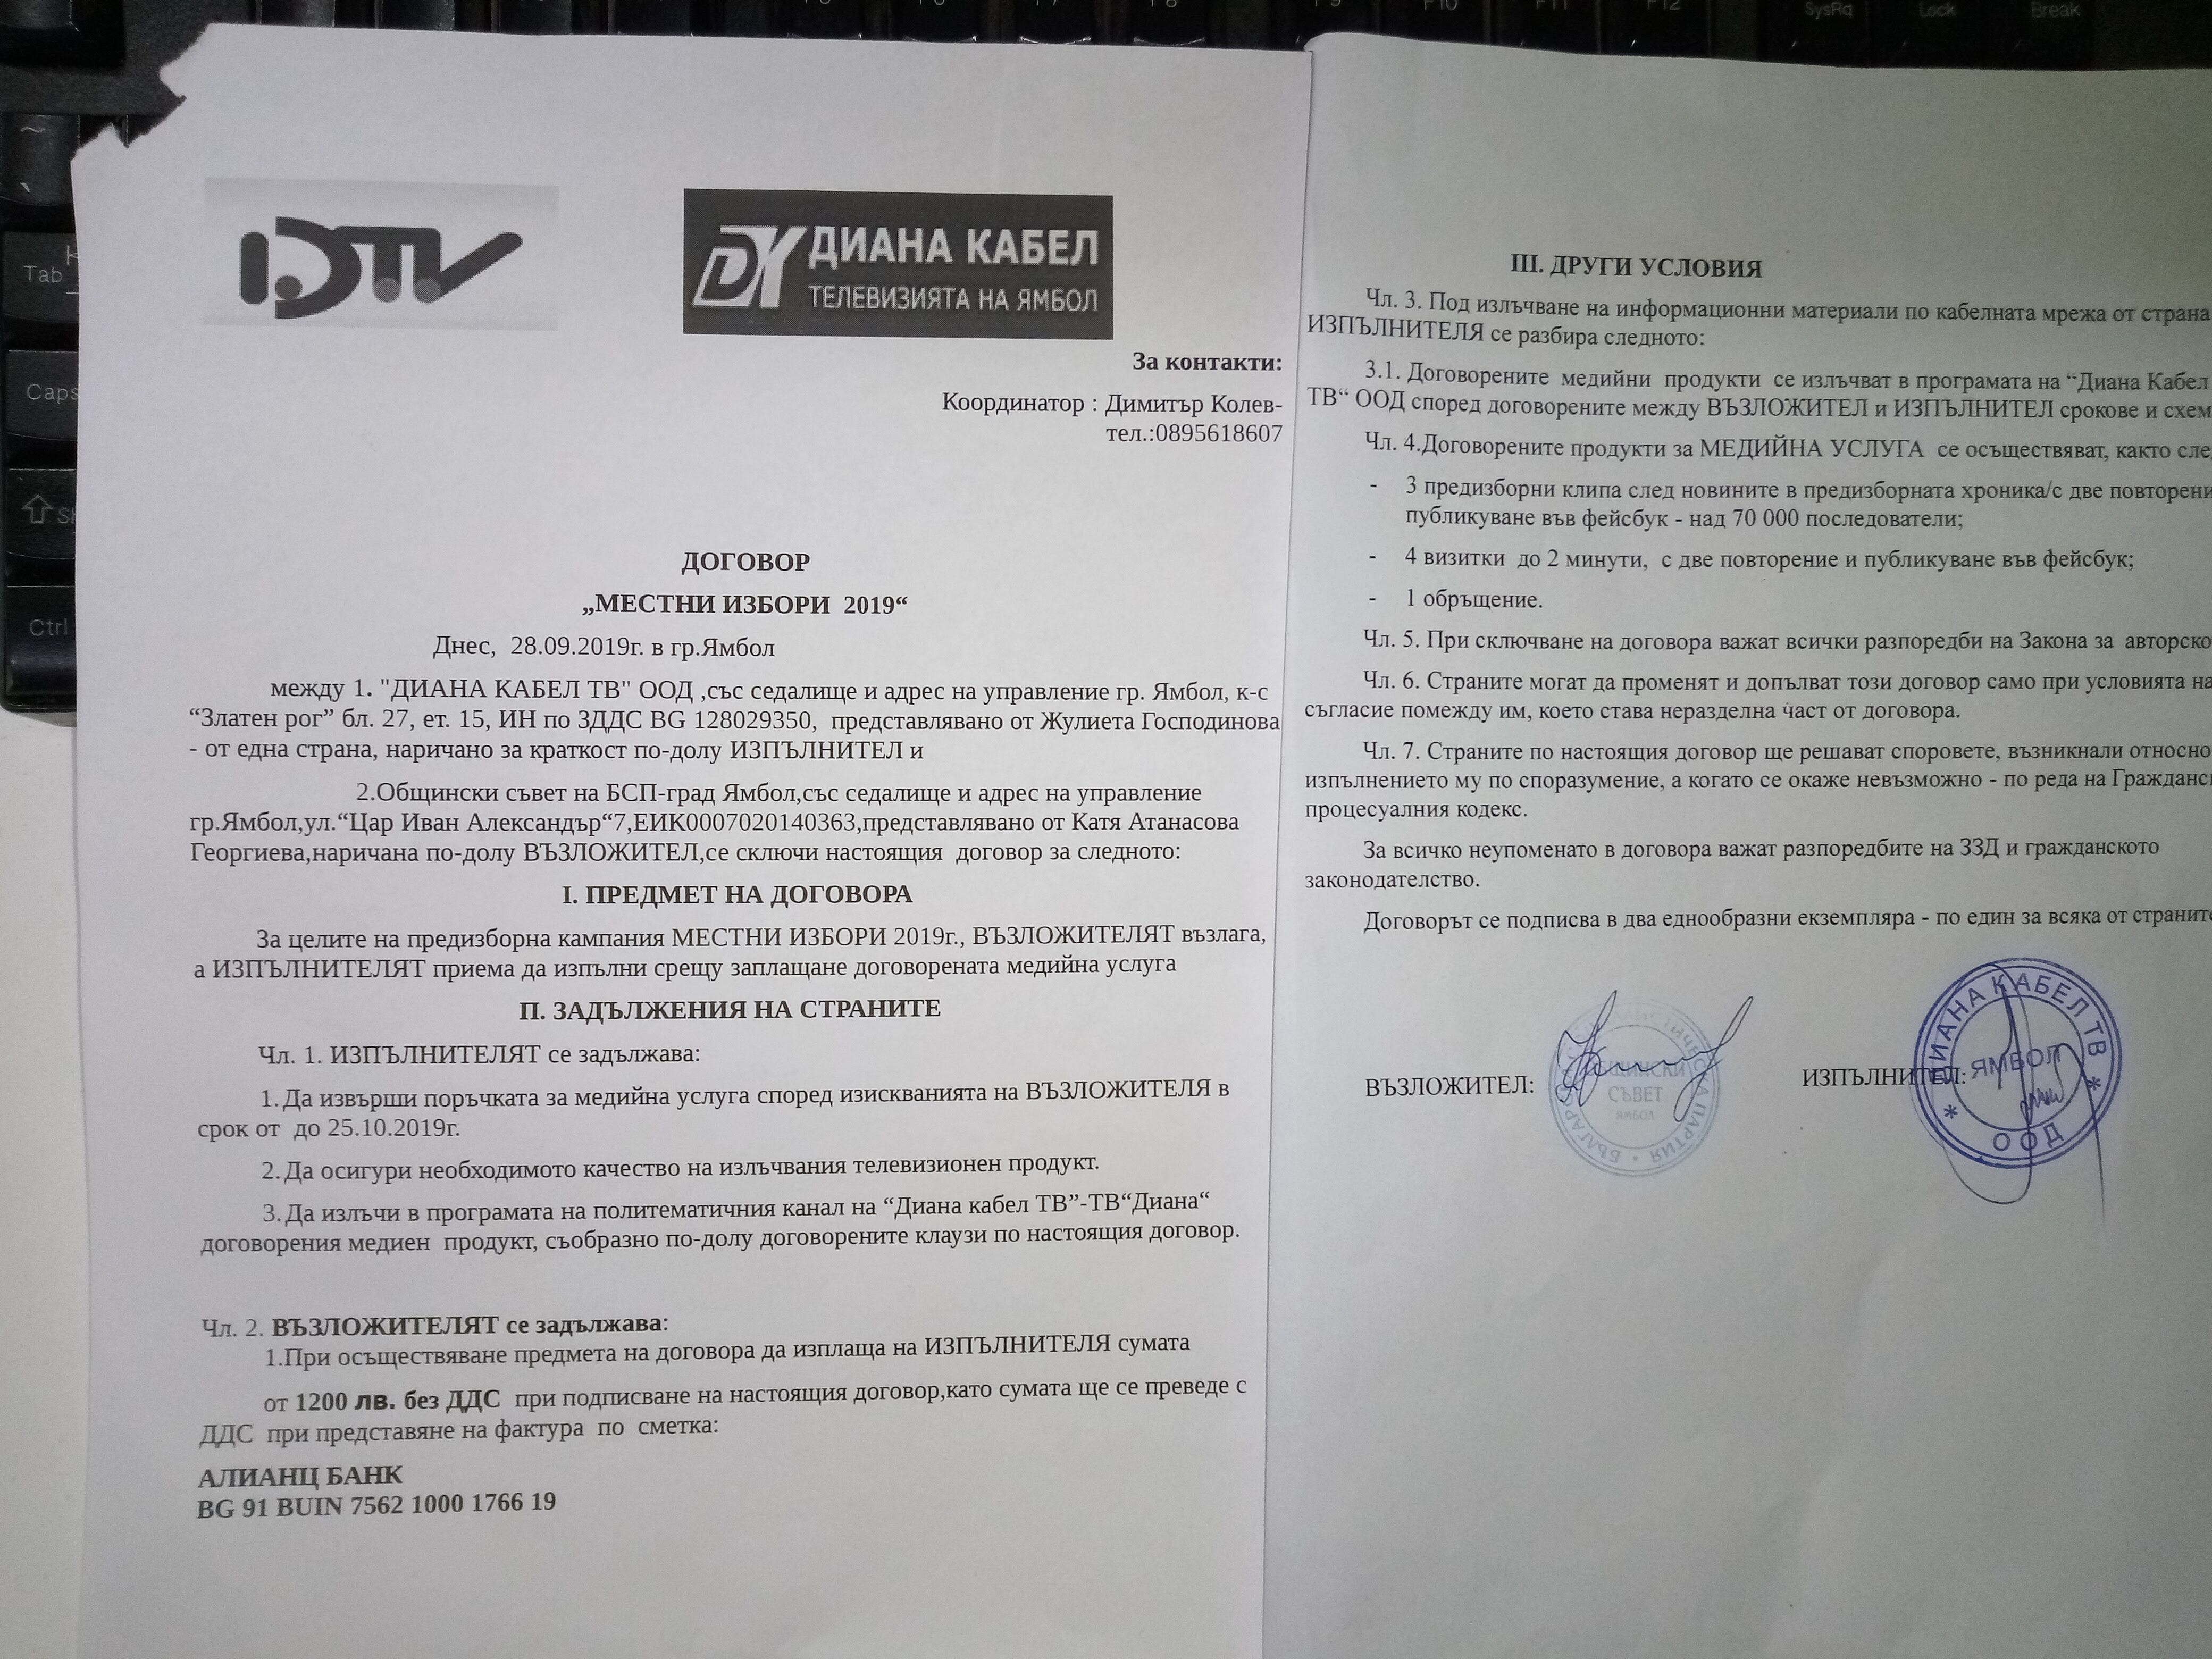 МЕСТНИ ИЗБОРИ 2019:               Договор за медийна услуга с БСП-Ямбол